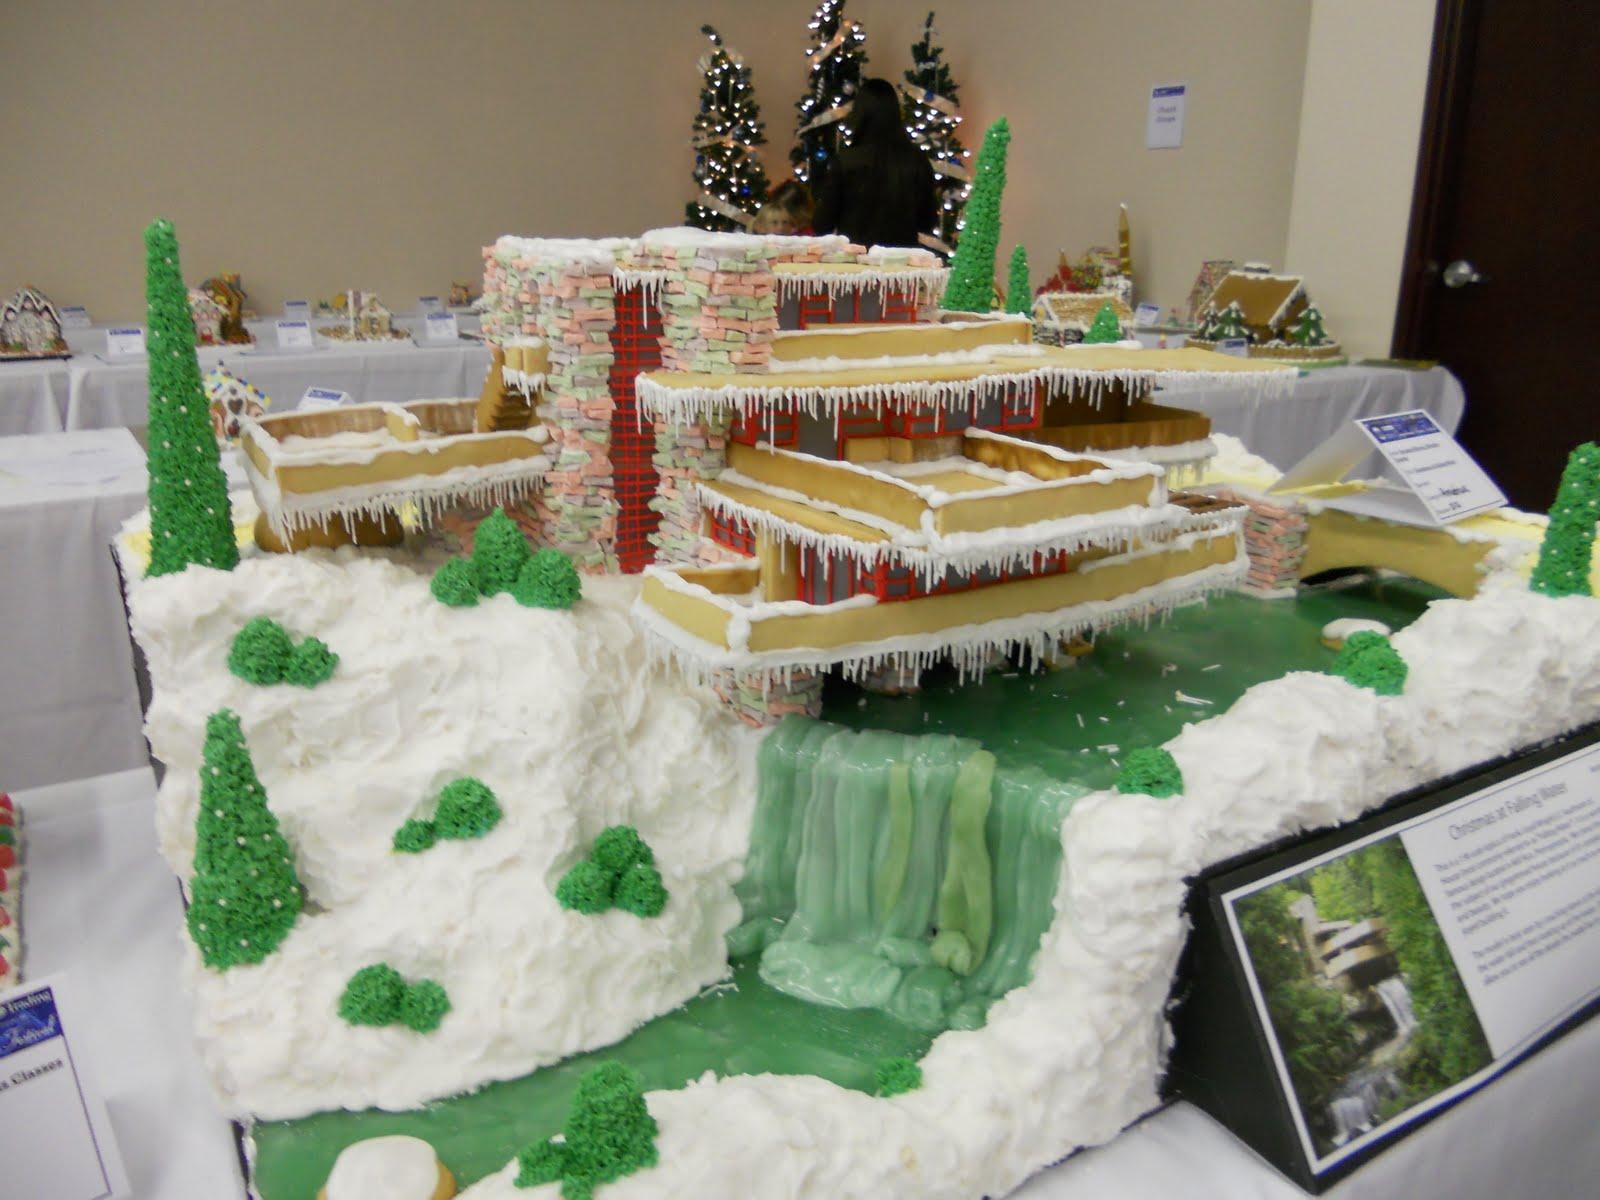 Architectural Cake Model Concept